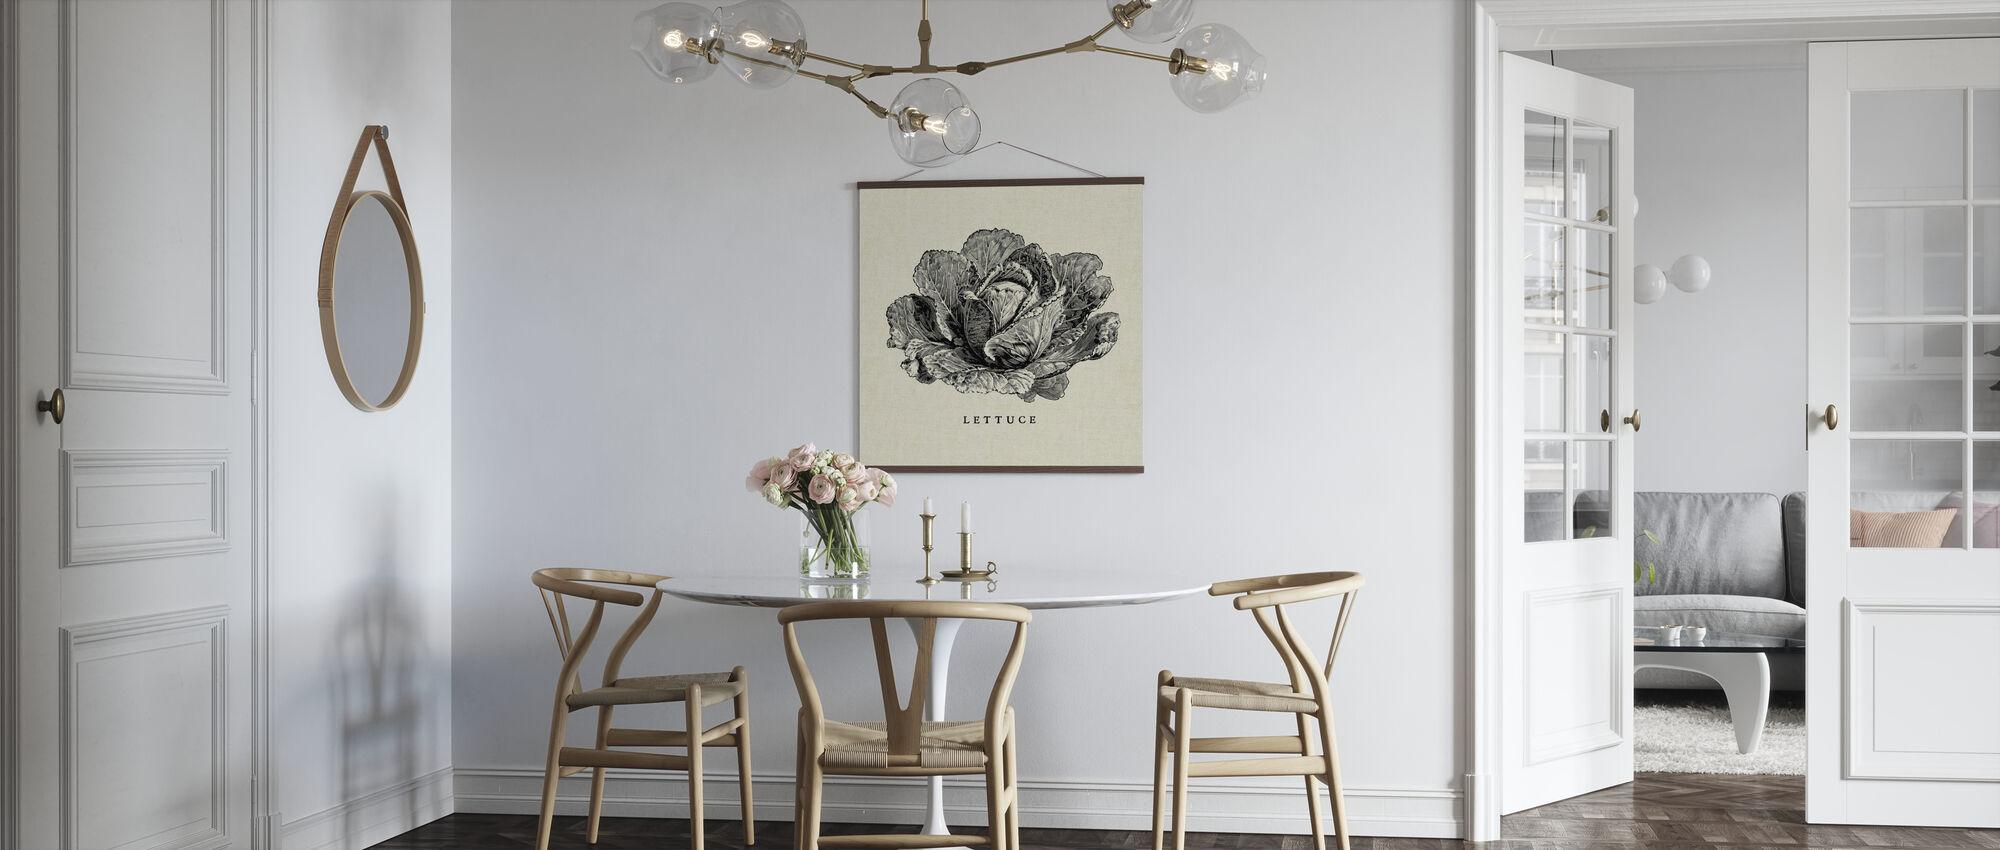 Kitchen Illustration - Lettuce - Poster - Kitchen